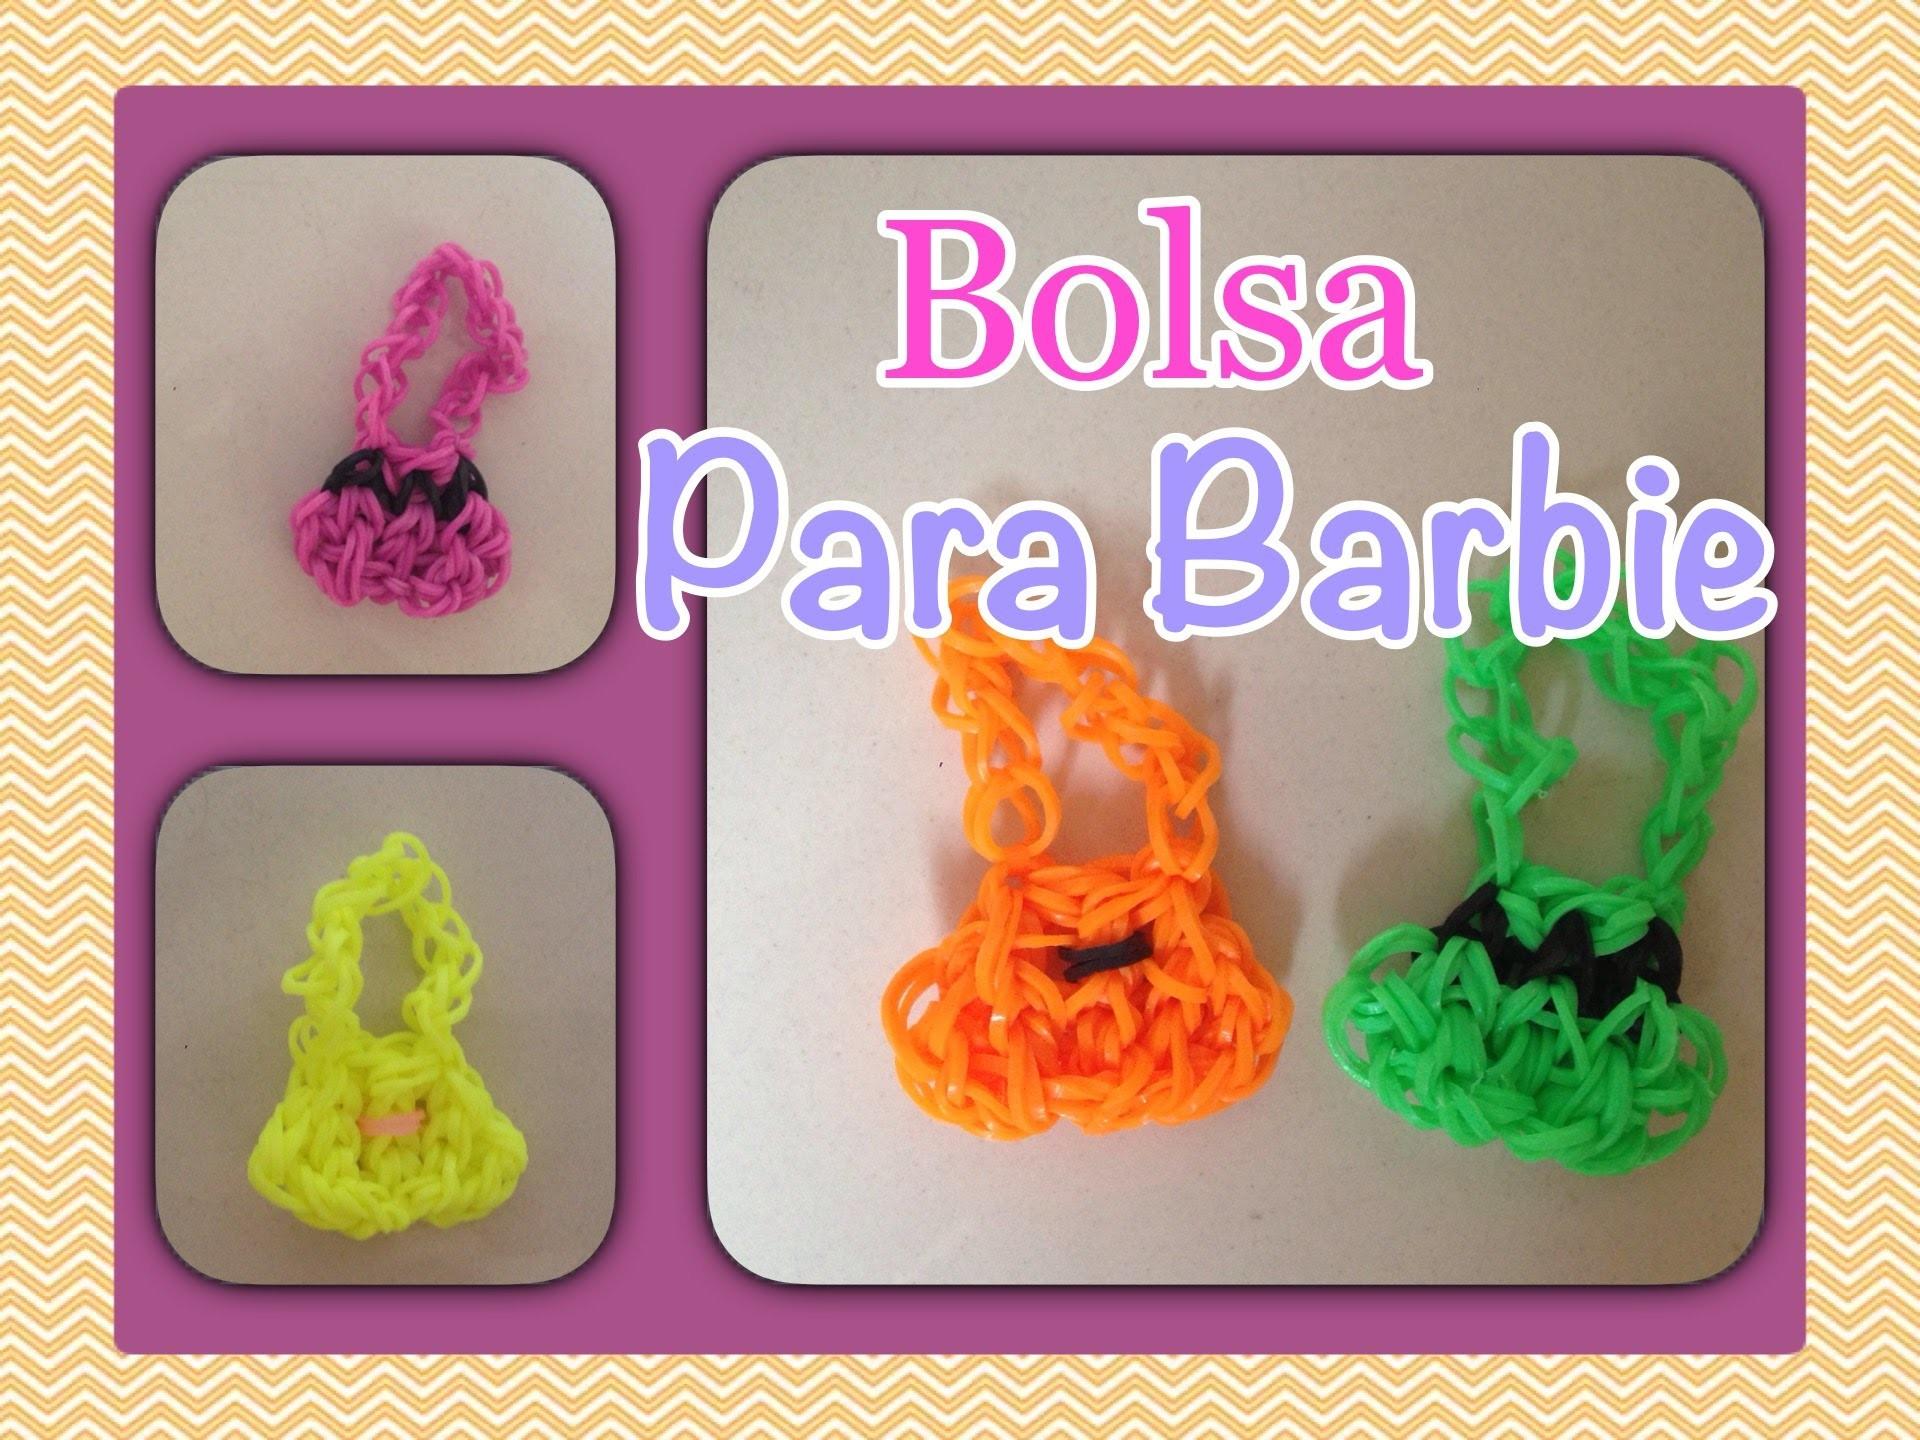 Rainbow Loom - Bolsa para Barbie | Criativa